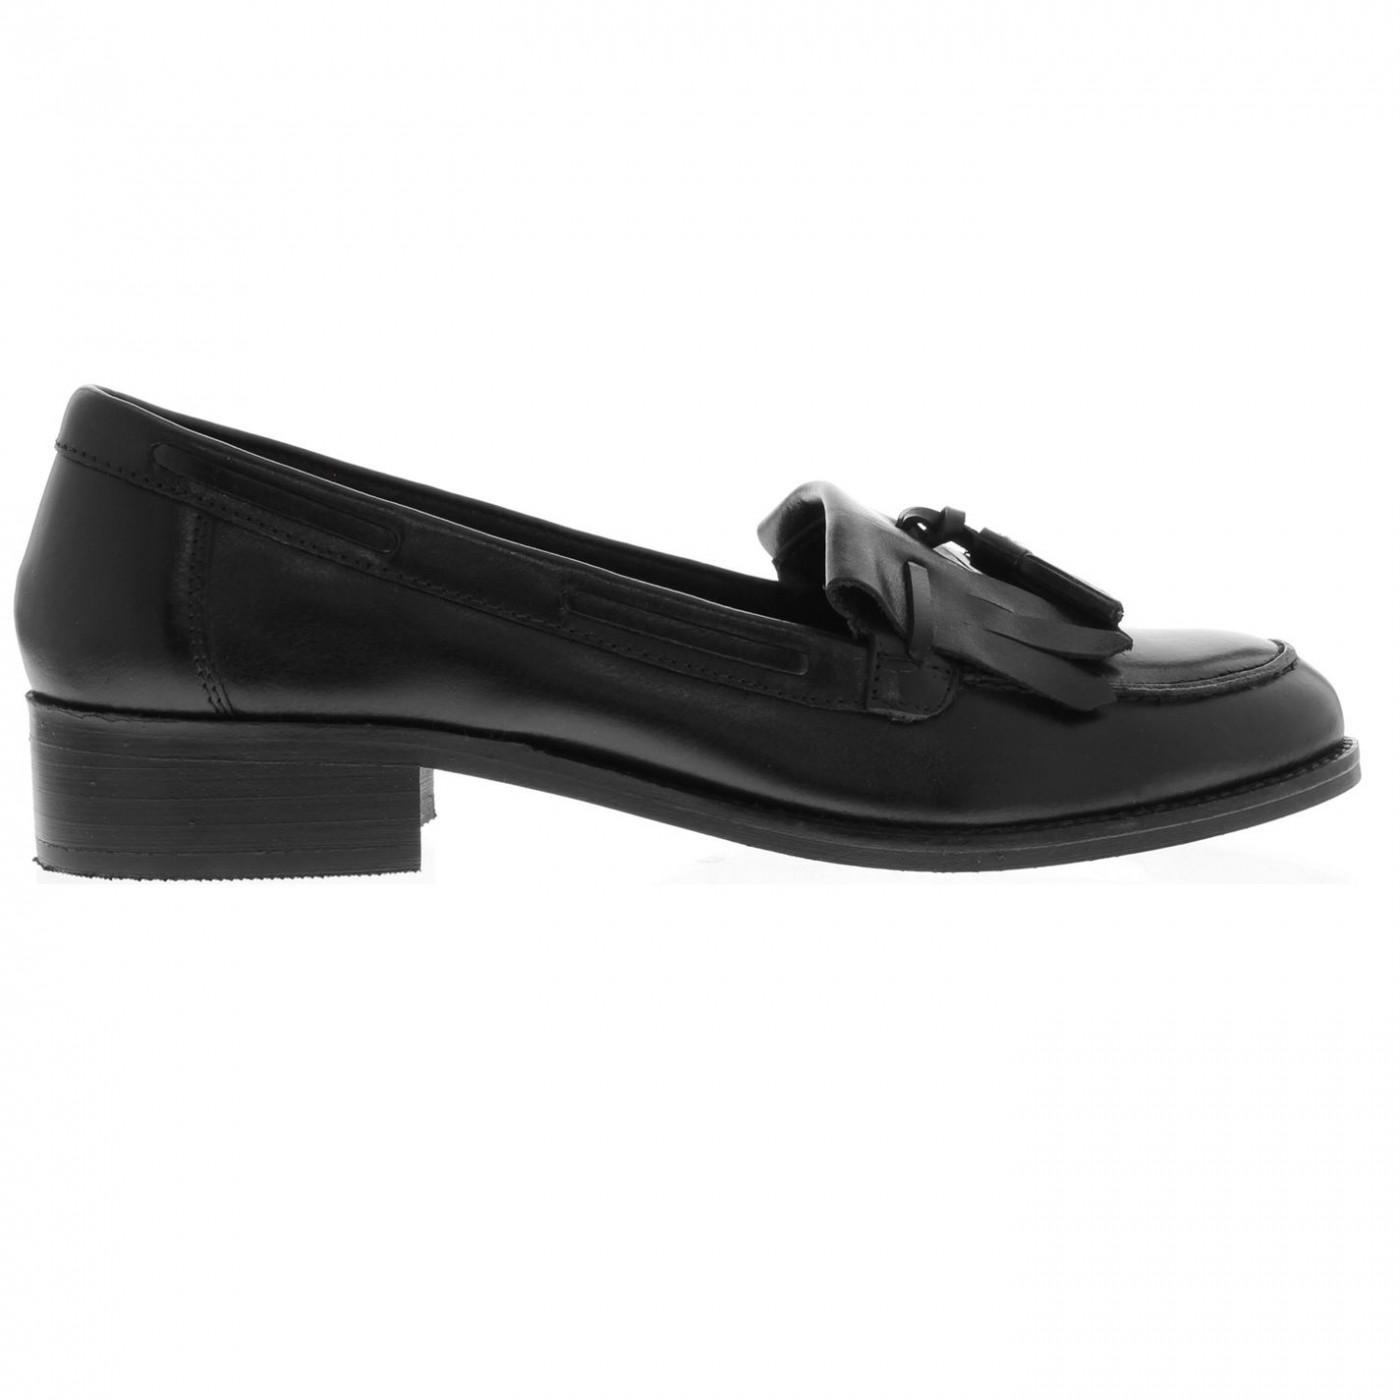 Firetrap Cesi Ladies Loafers